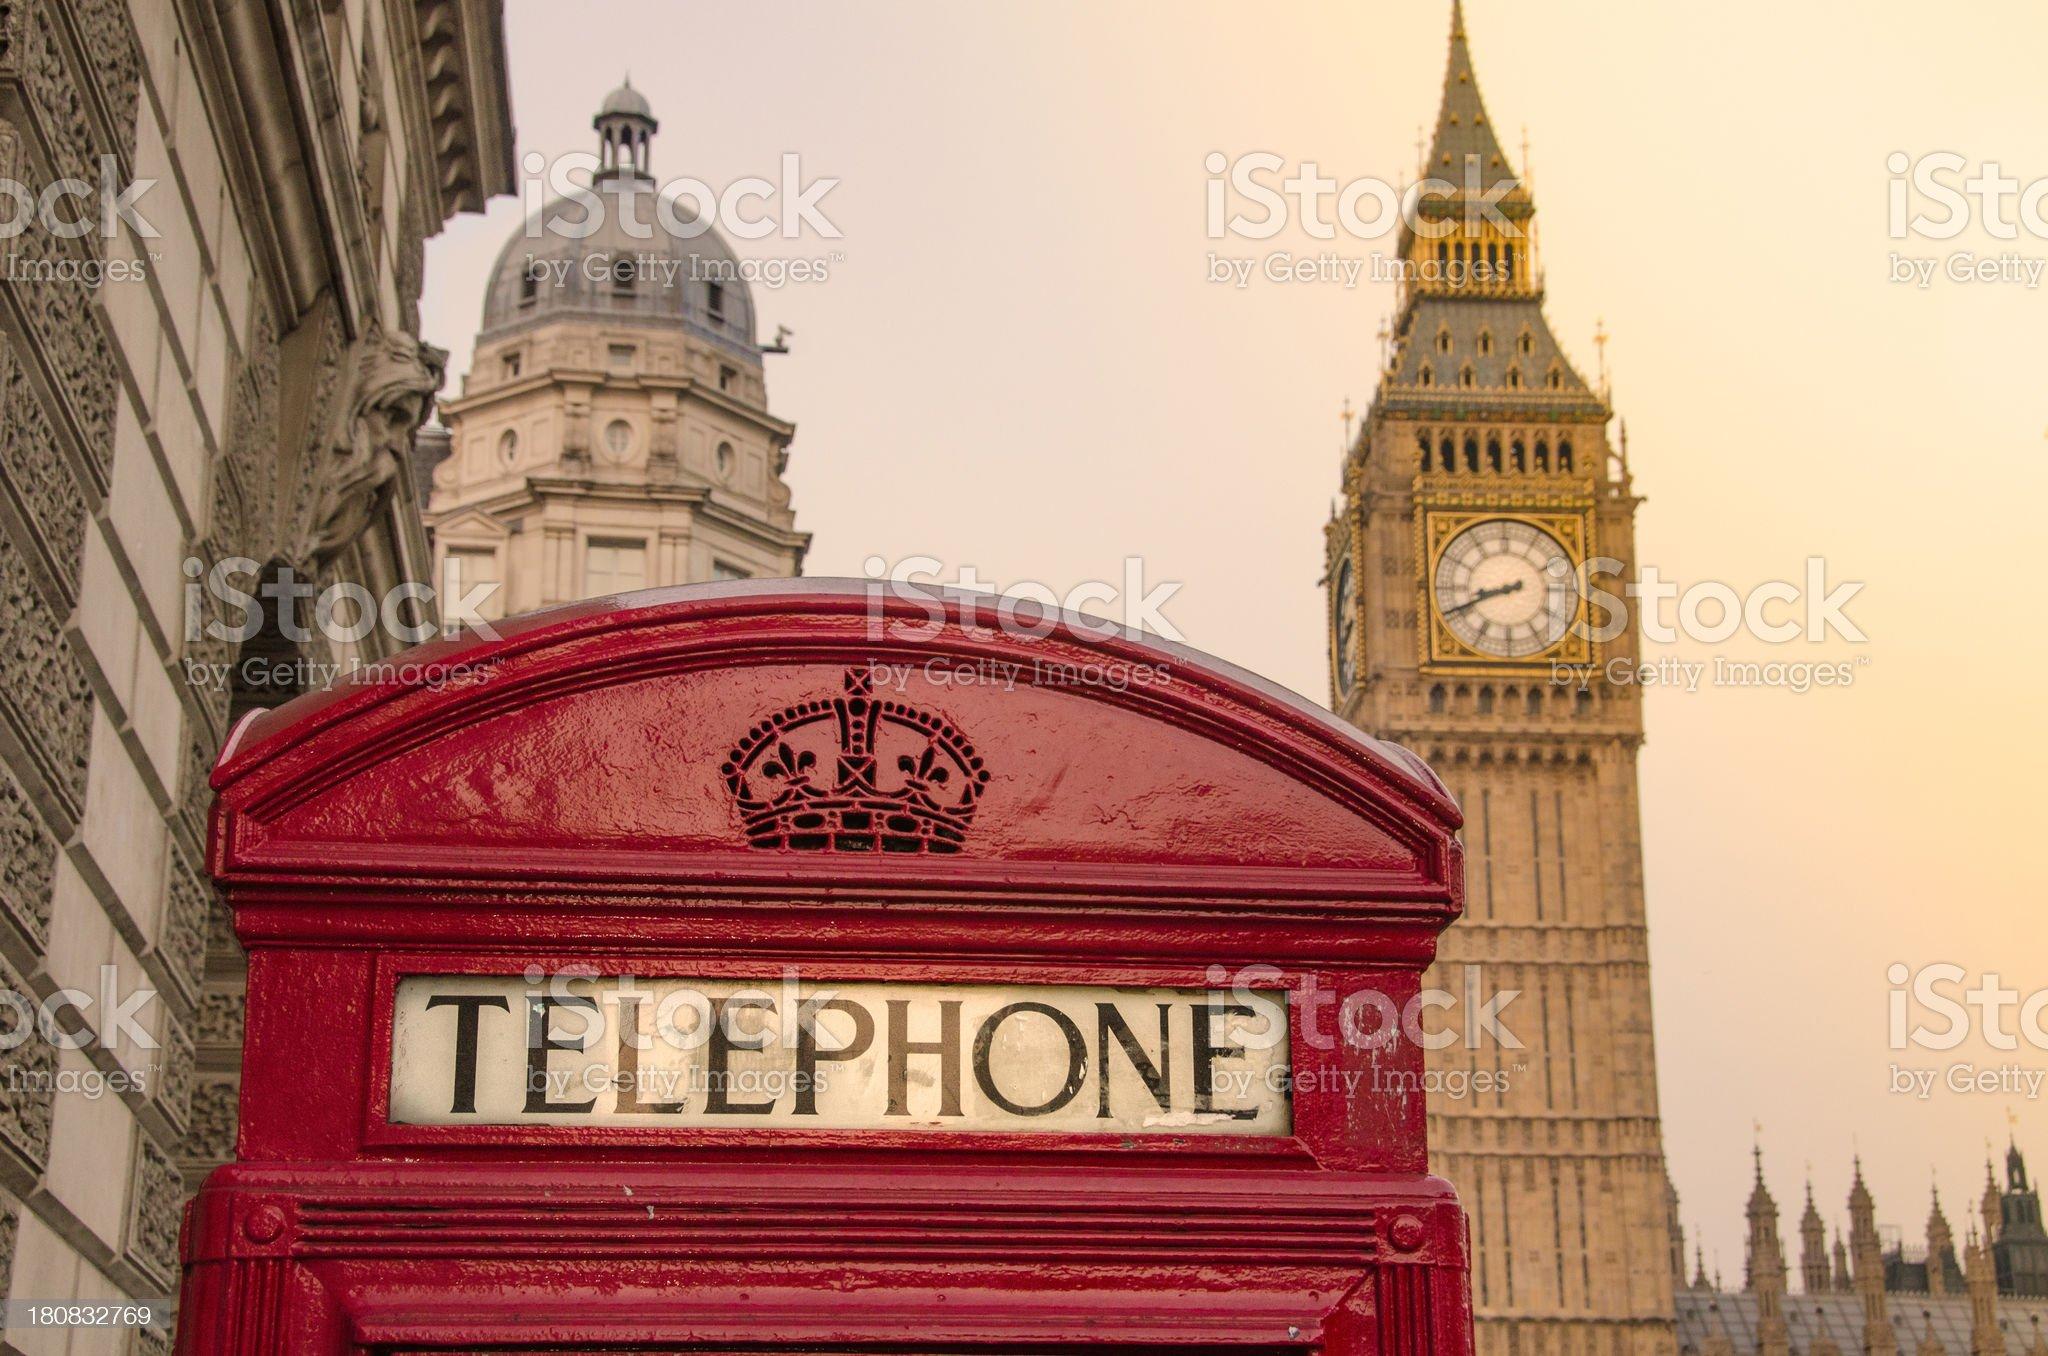 Telephone Box and Big Ben - London royalty-free stock photo